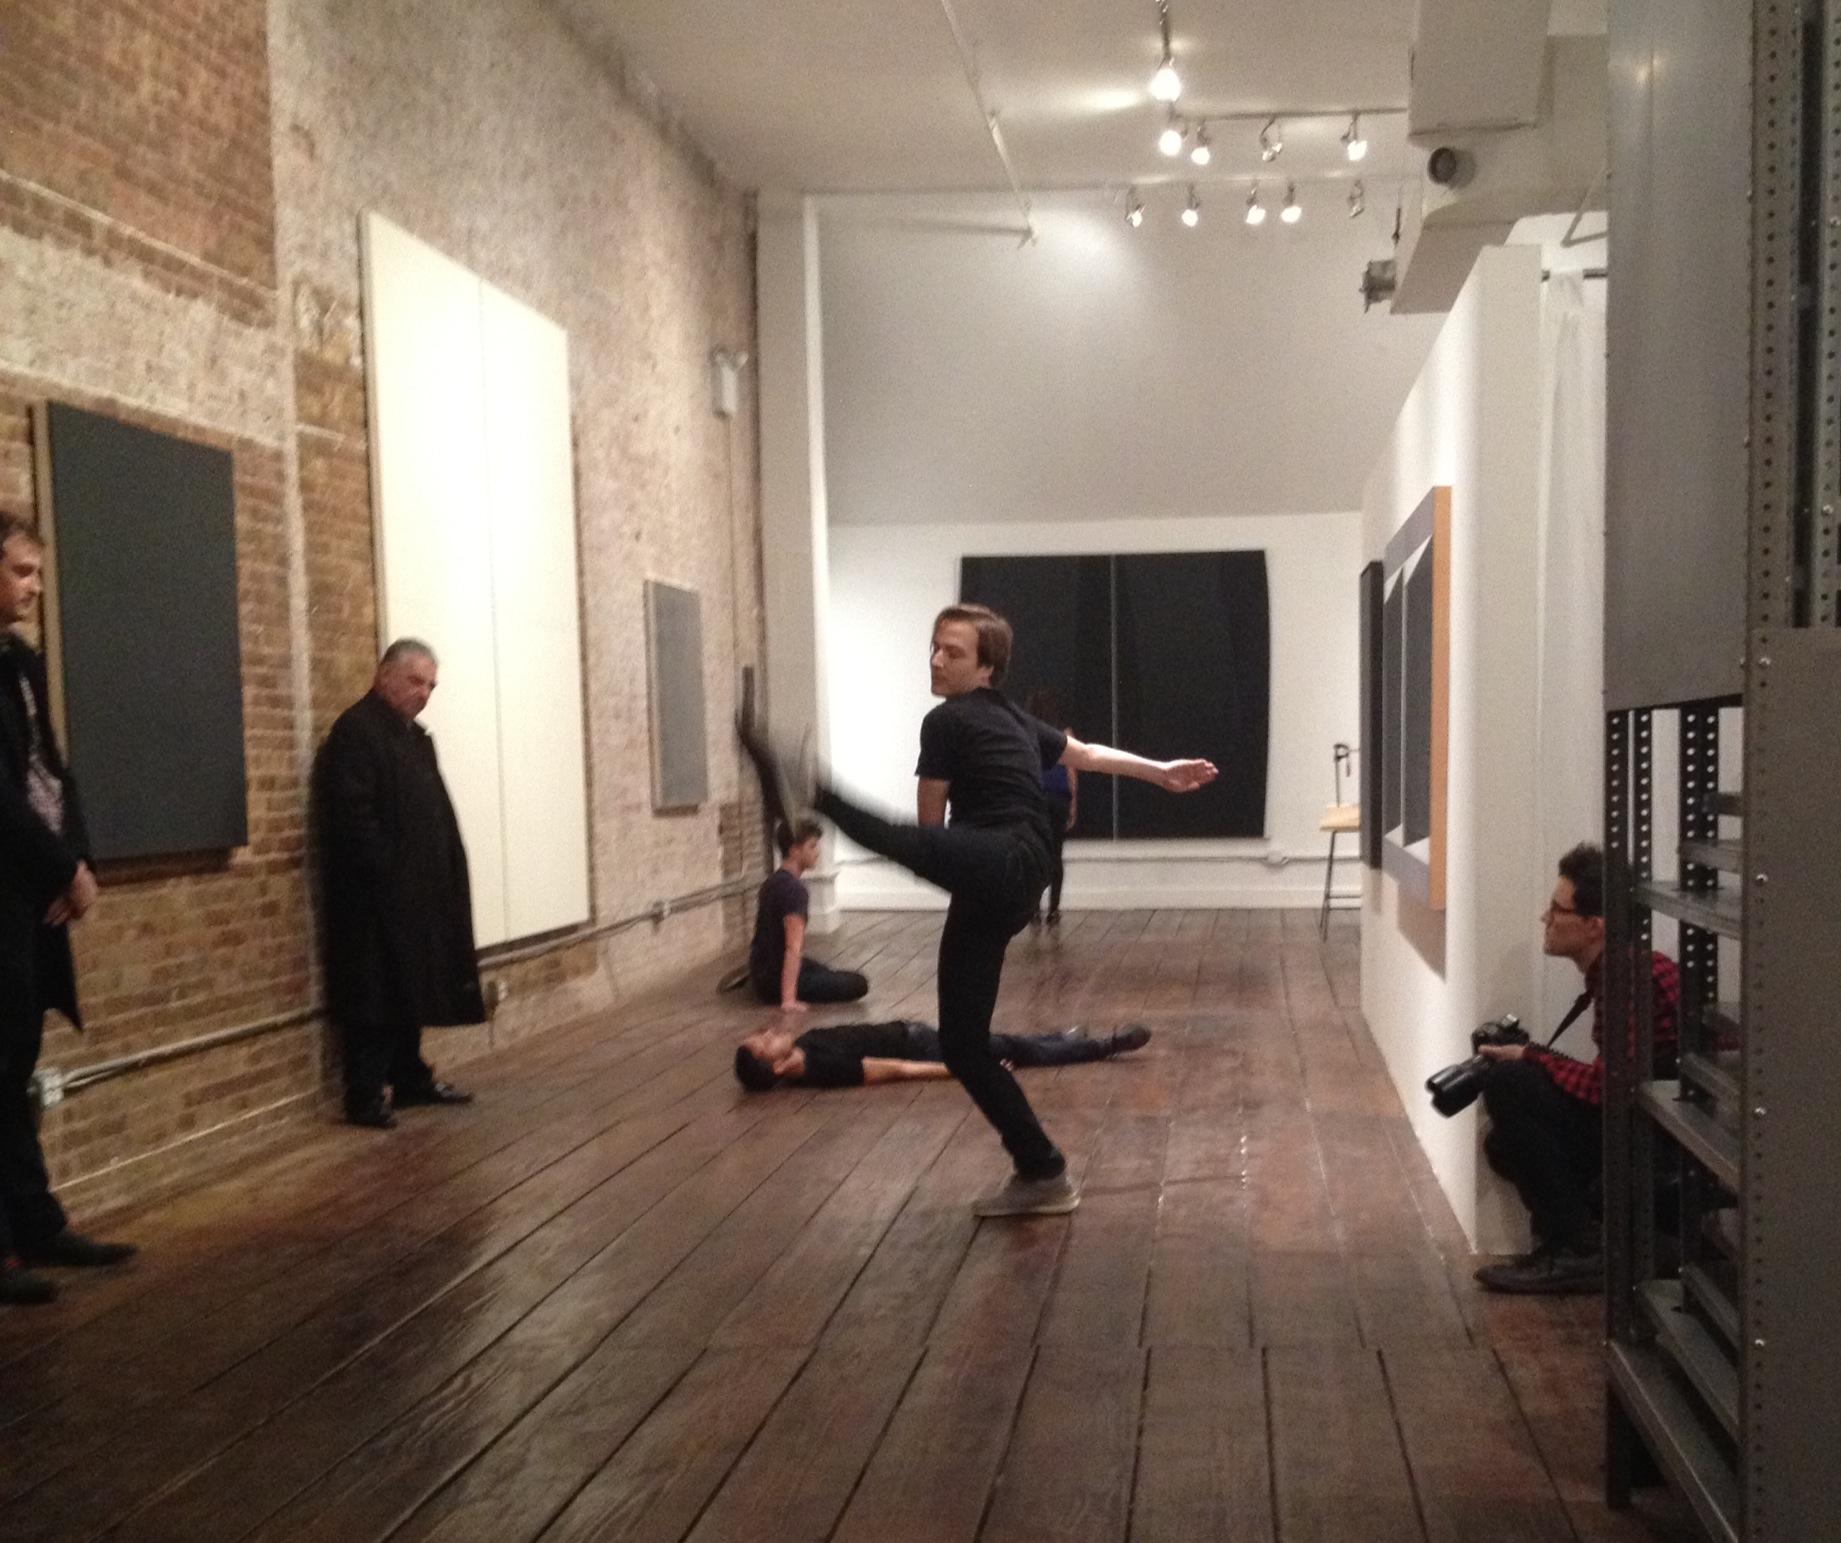 Joshua Tuason, Justin Rivera, Ian Spencer Bell, and Jenna Liberati in  Wallkill at TEMP Art Space, New York City, November 9, 2013.Photo by Eric Brown.